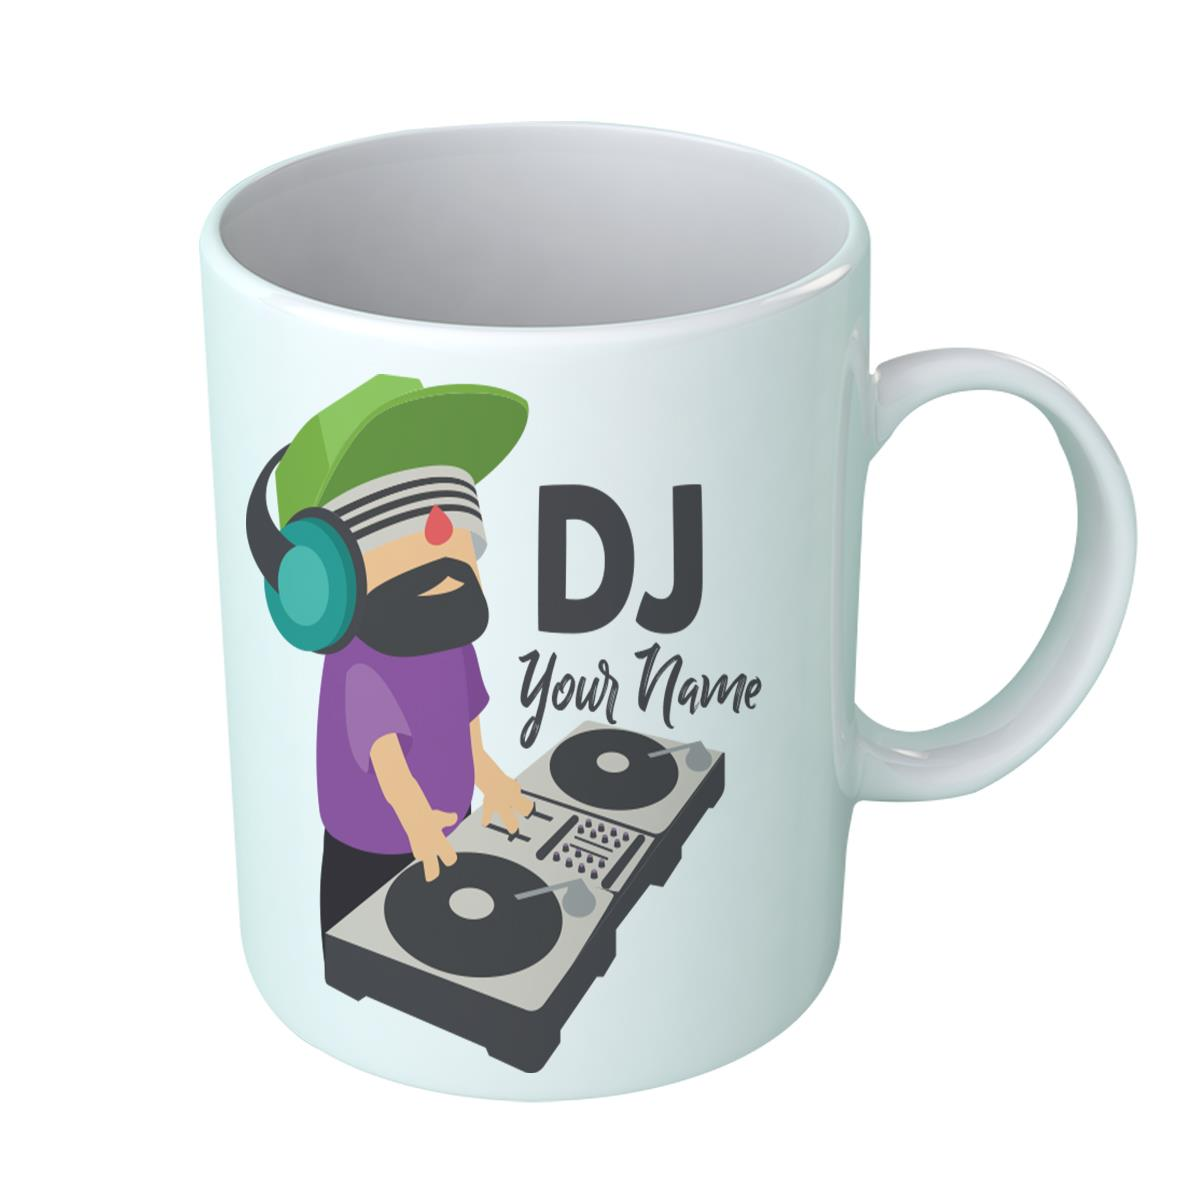 Dj Your Name Personalised Design Coffee Mug Rave Birthday Gift House Deejay Ebay